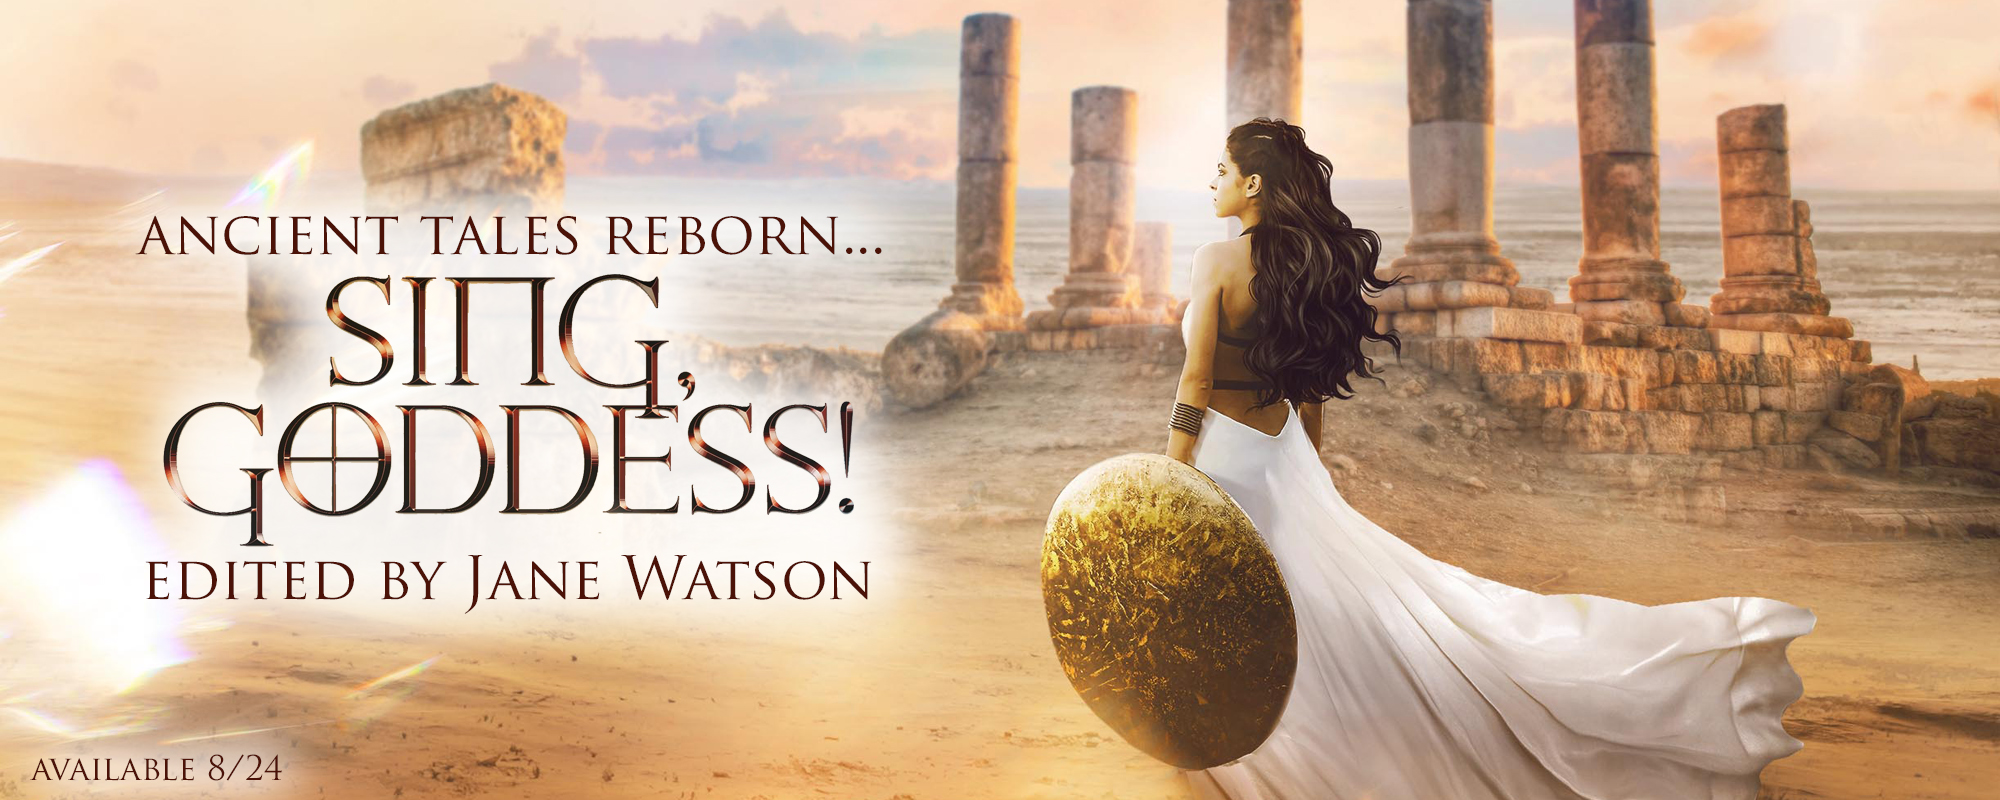 Sing, Goddess! edited by Jane Watson, coming soon